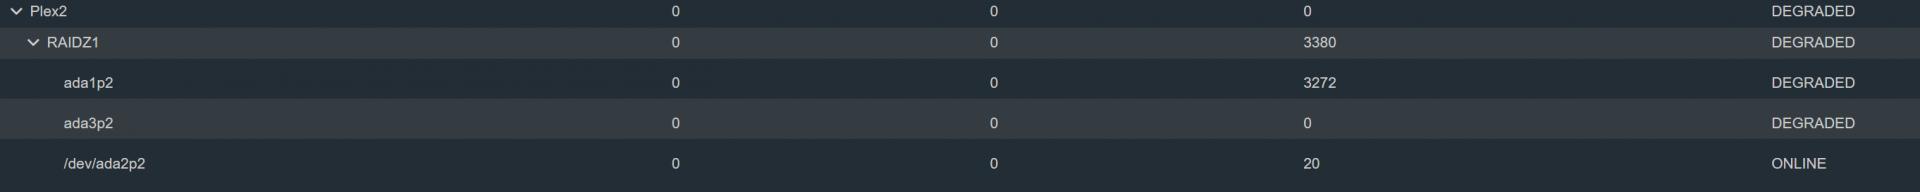 Degraded Pool | iXsystems Community